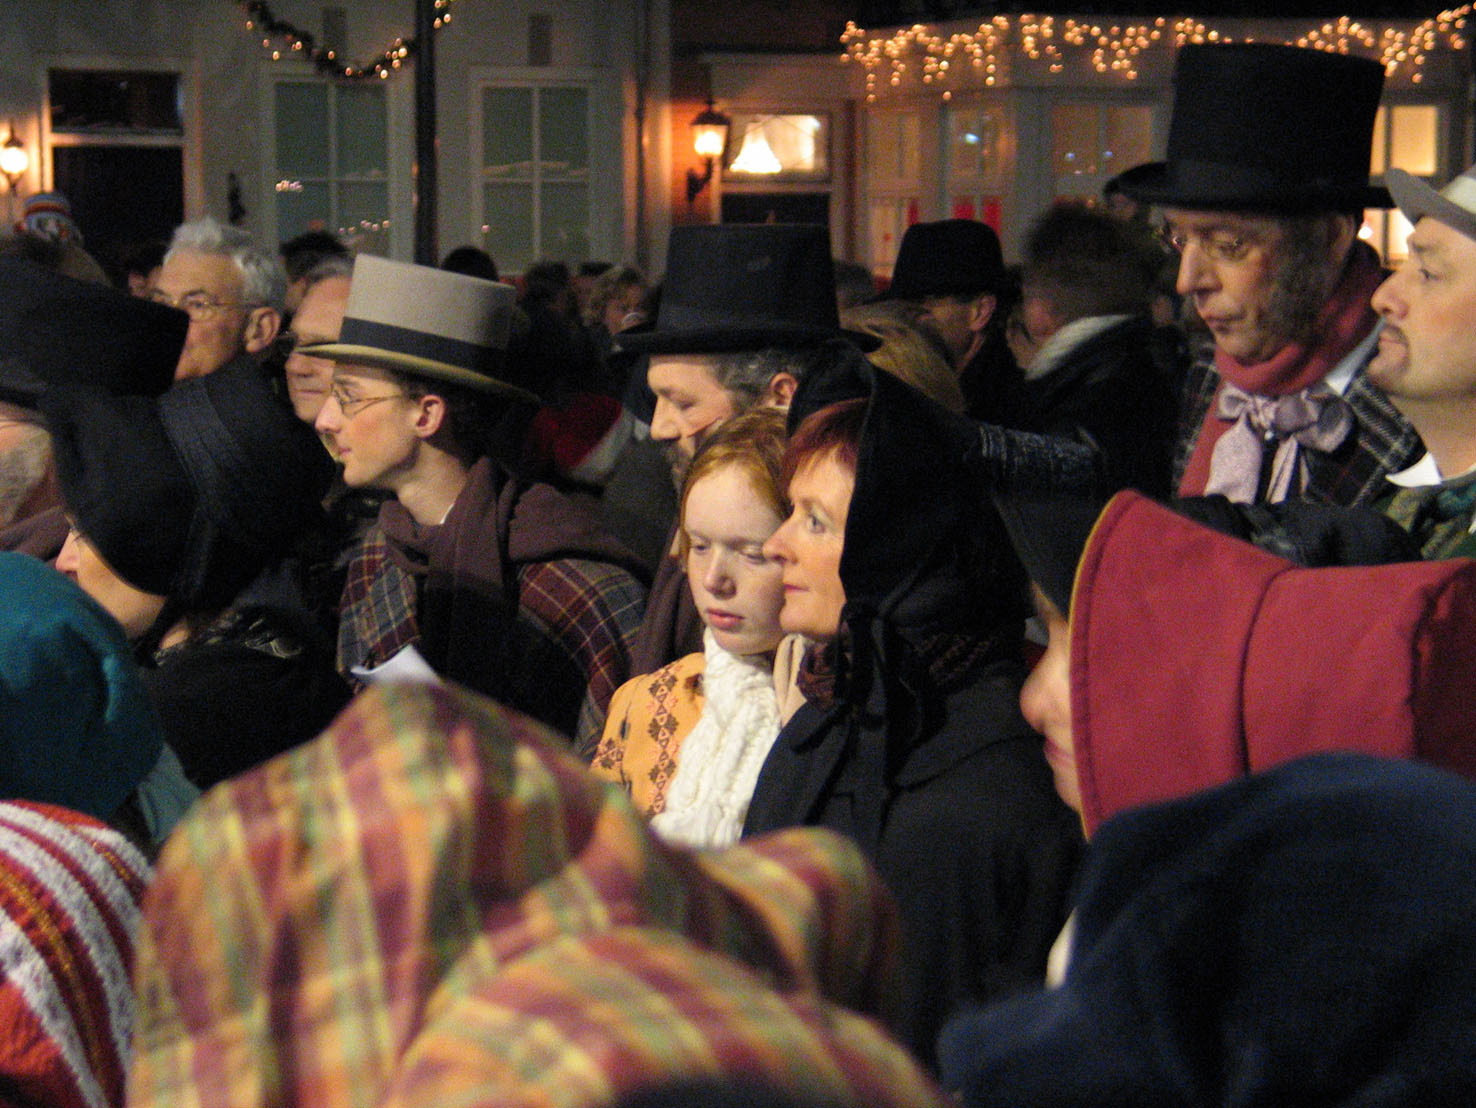 080 - Kerstmarkt Helmond 2003.jpg